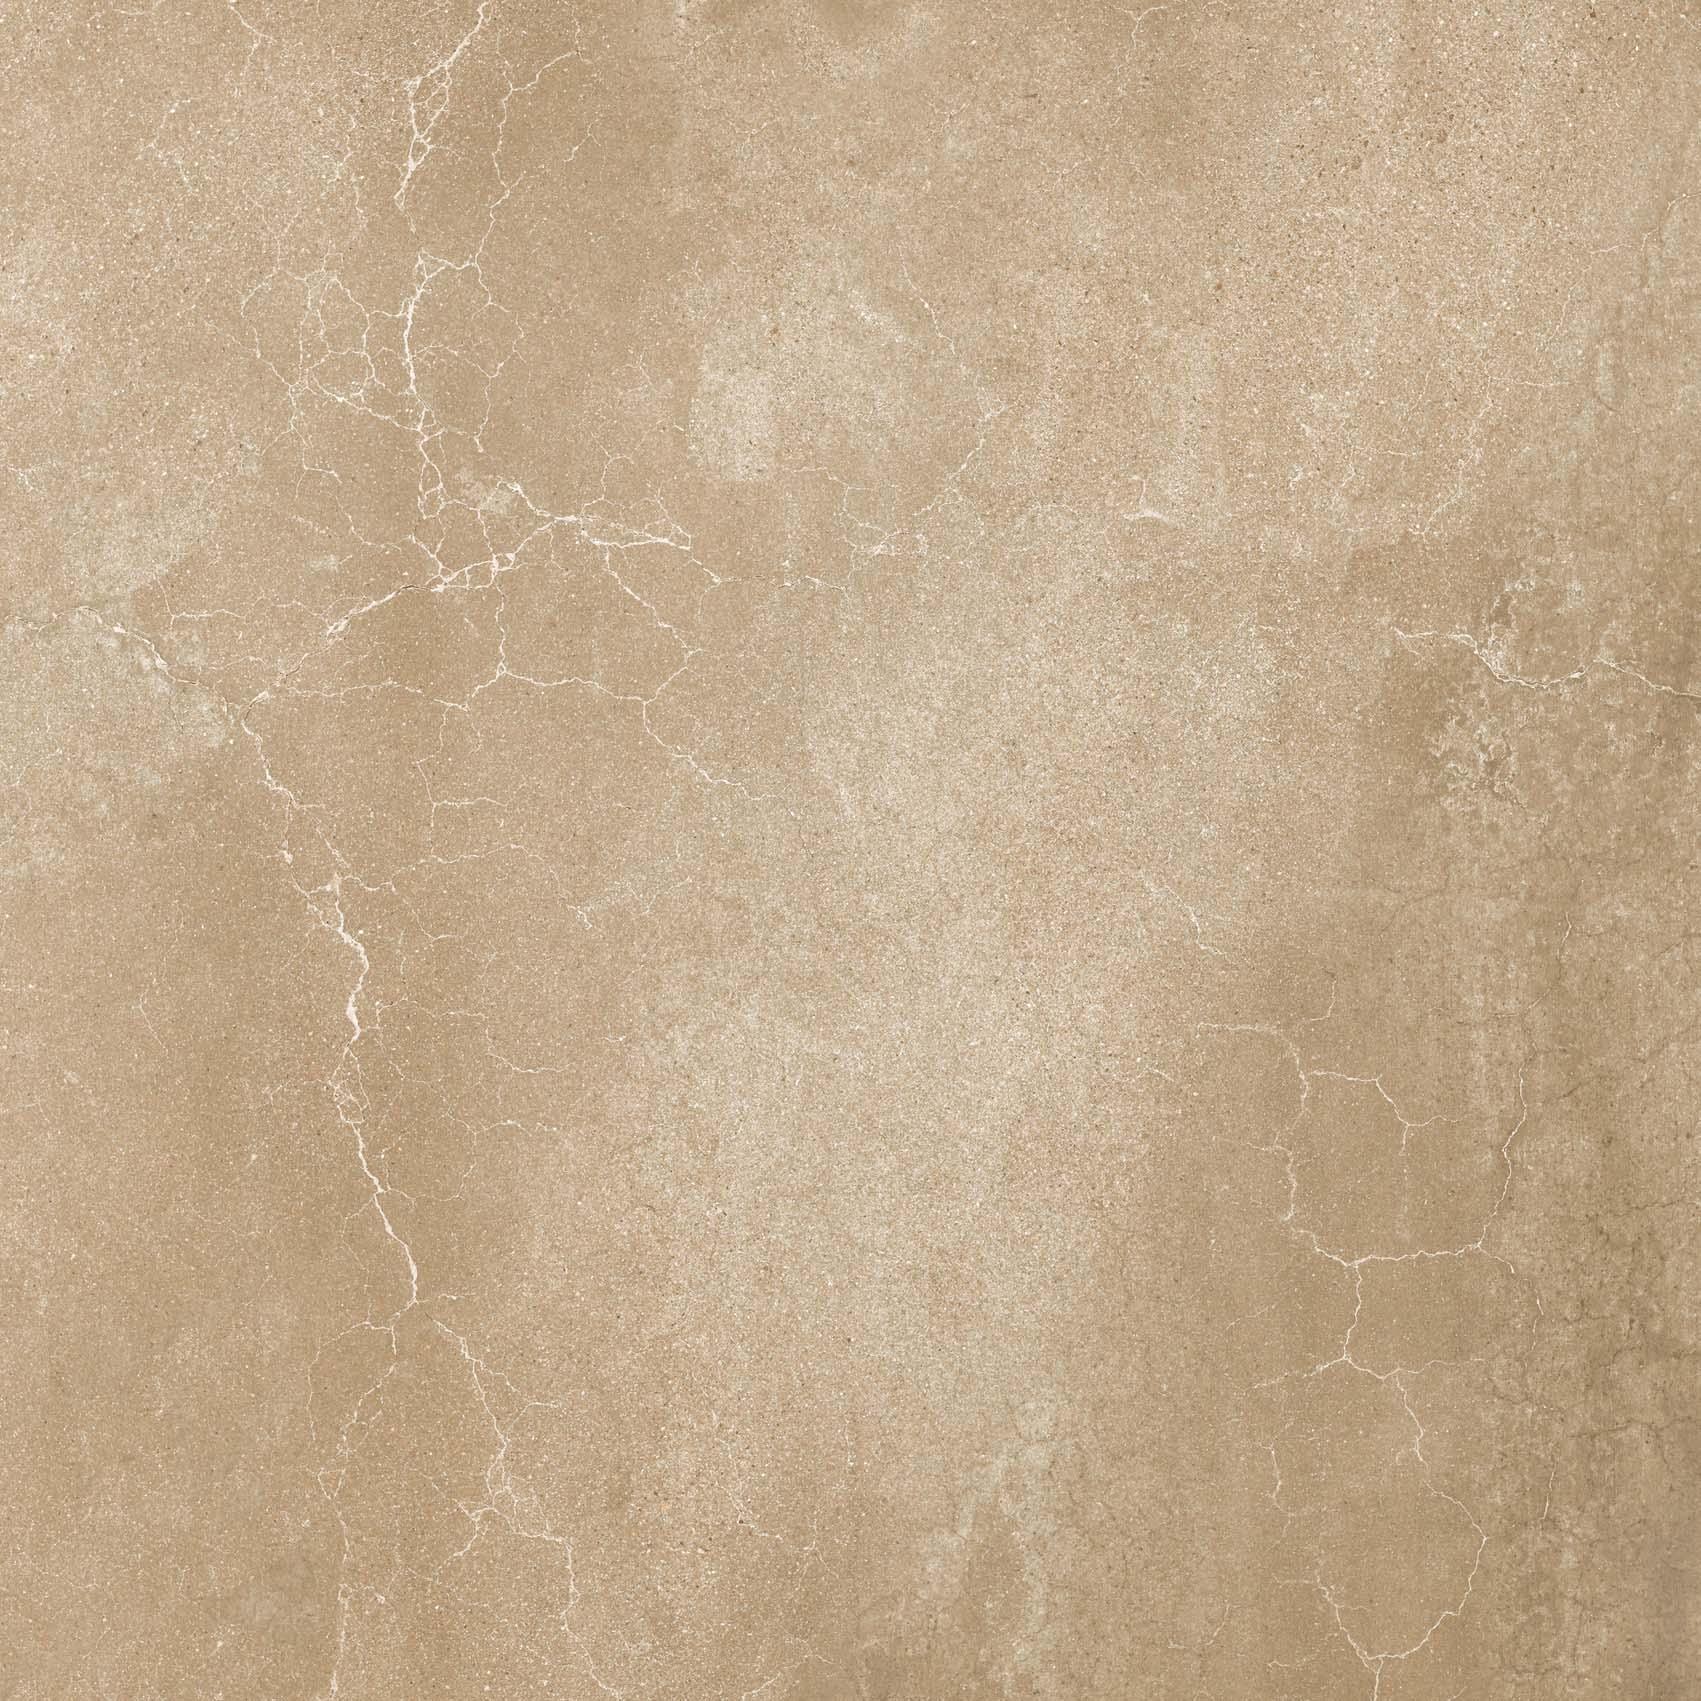 Avenue Siena Semi Gloss Floor Glossy Brown Porcelain